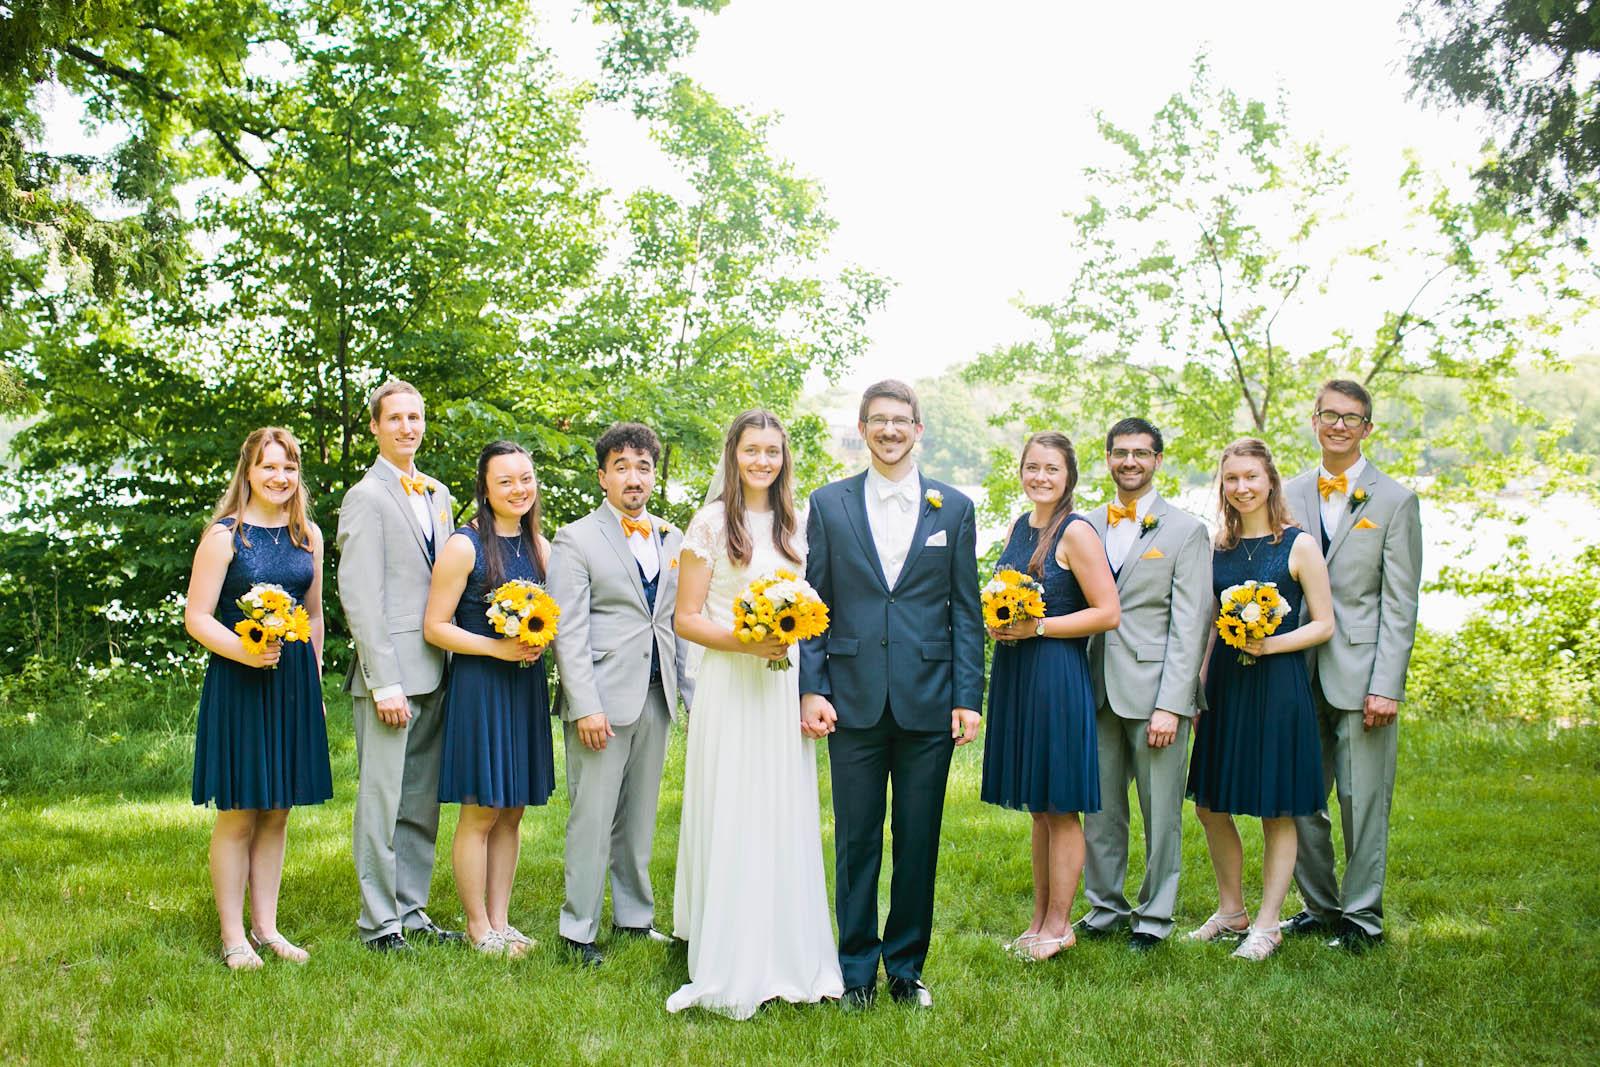 premiere iowa wedding photographer fall wedding 2018 bride